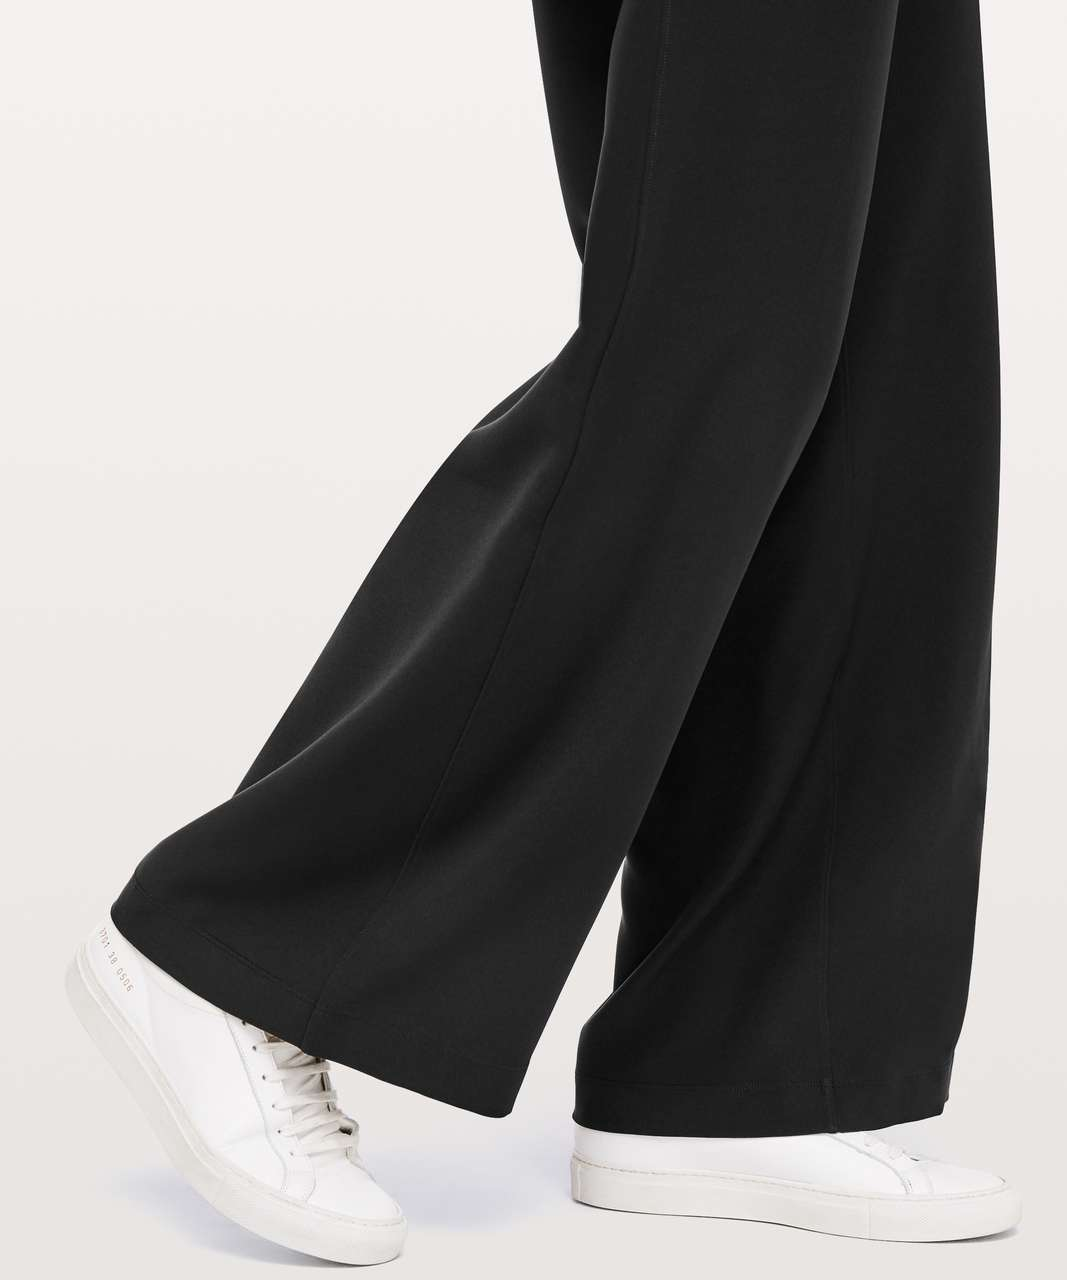 "Lululemon On The Fly Pant *Wide Leg Woven 31.5"" - Black"